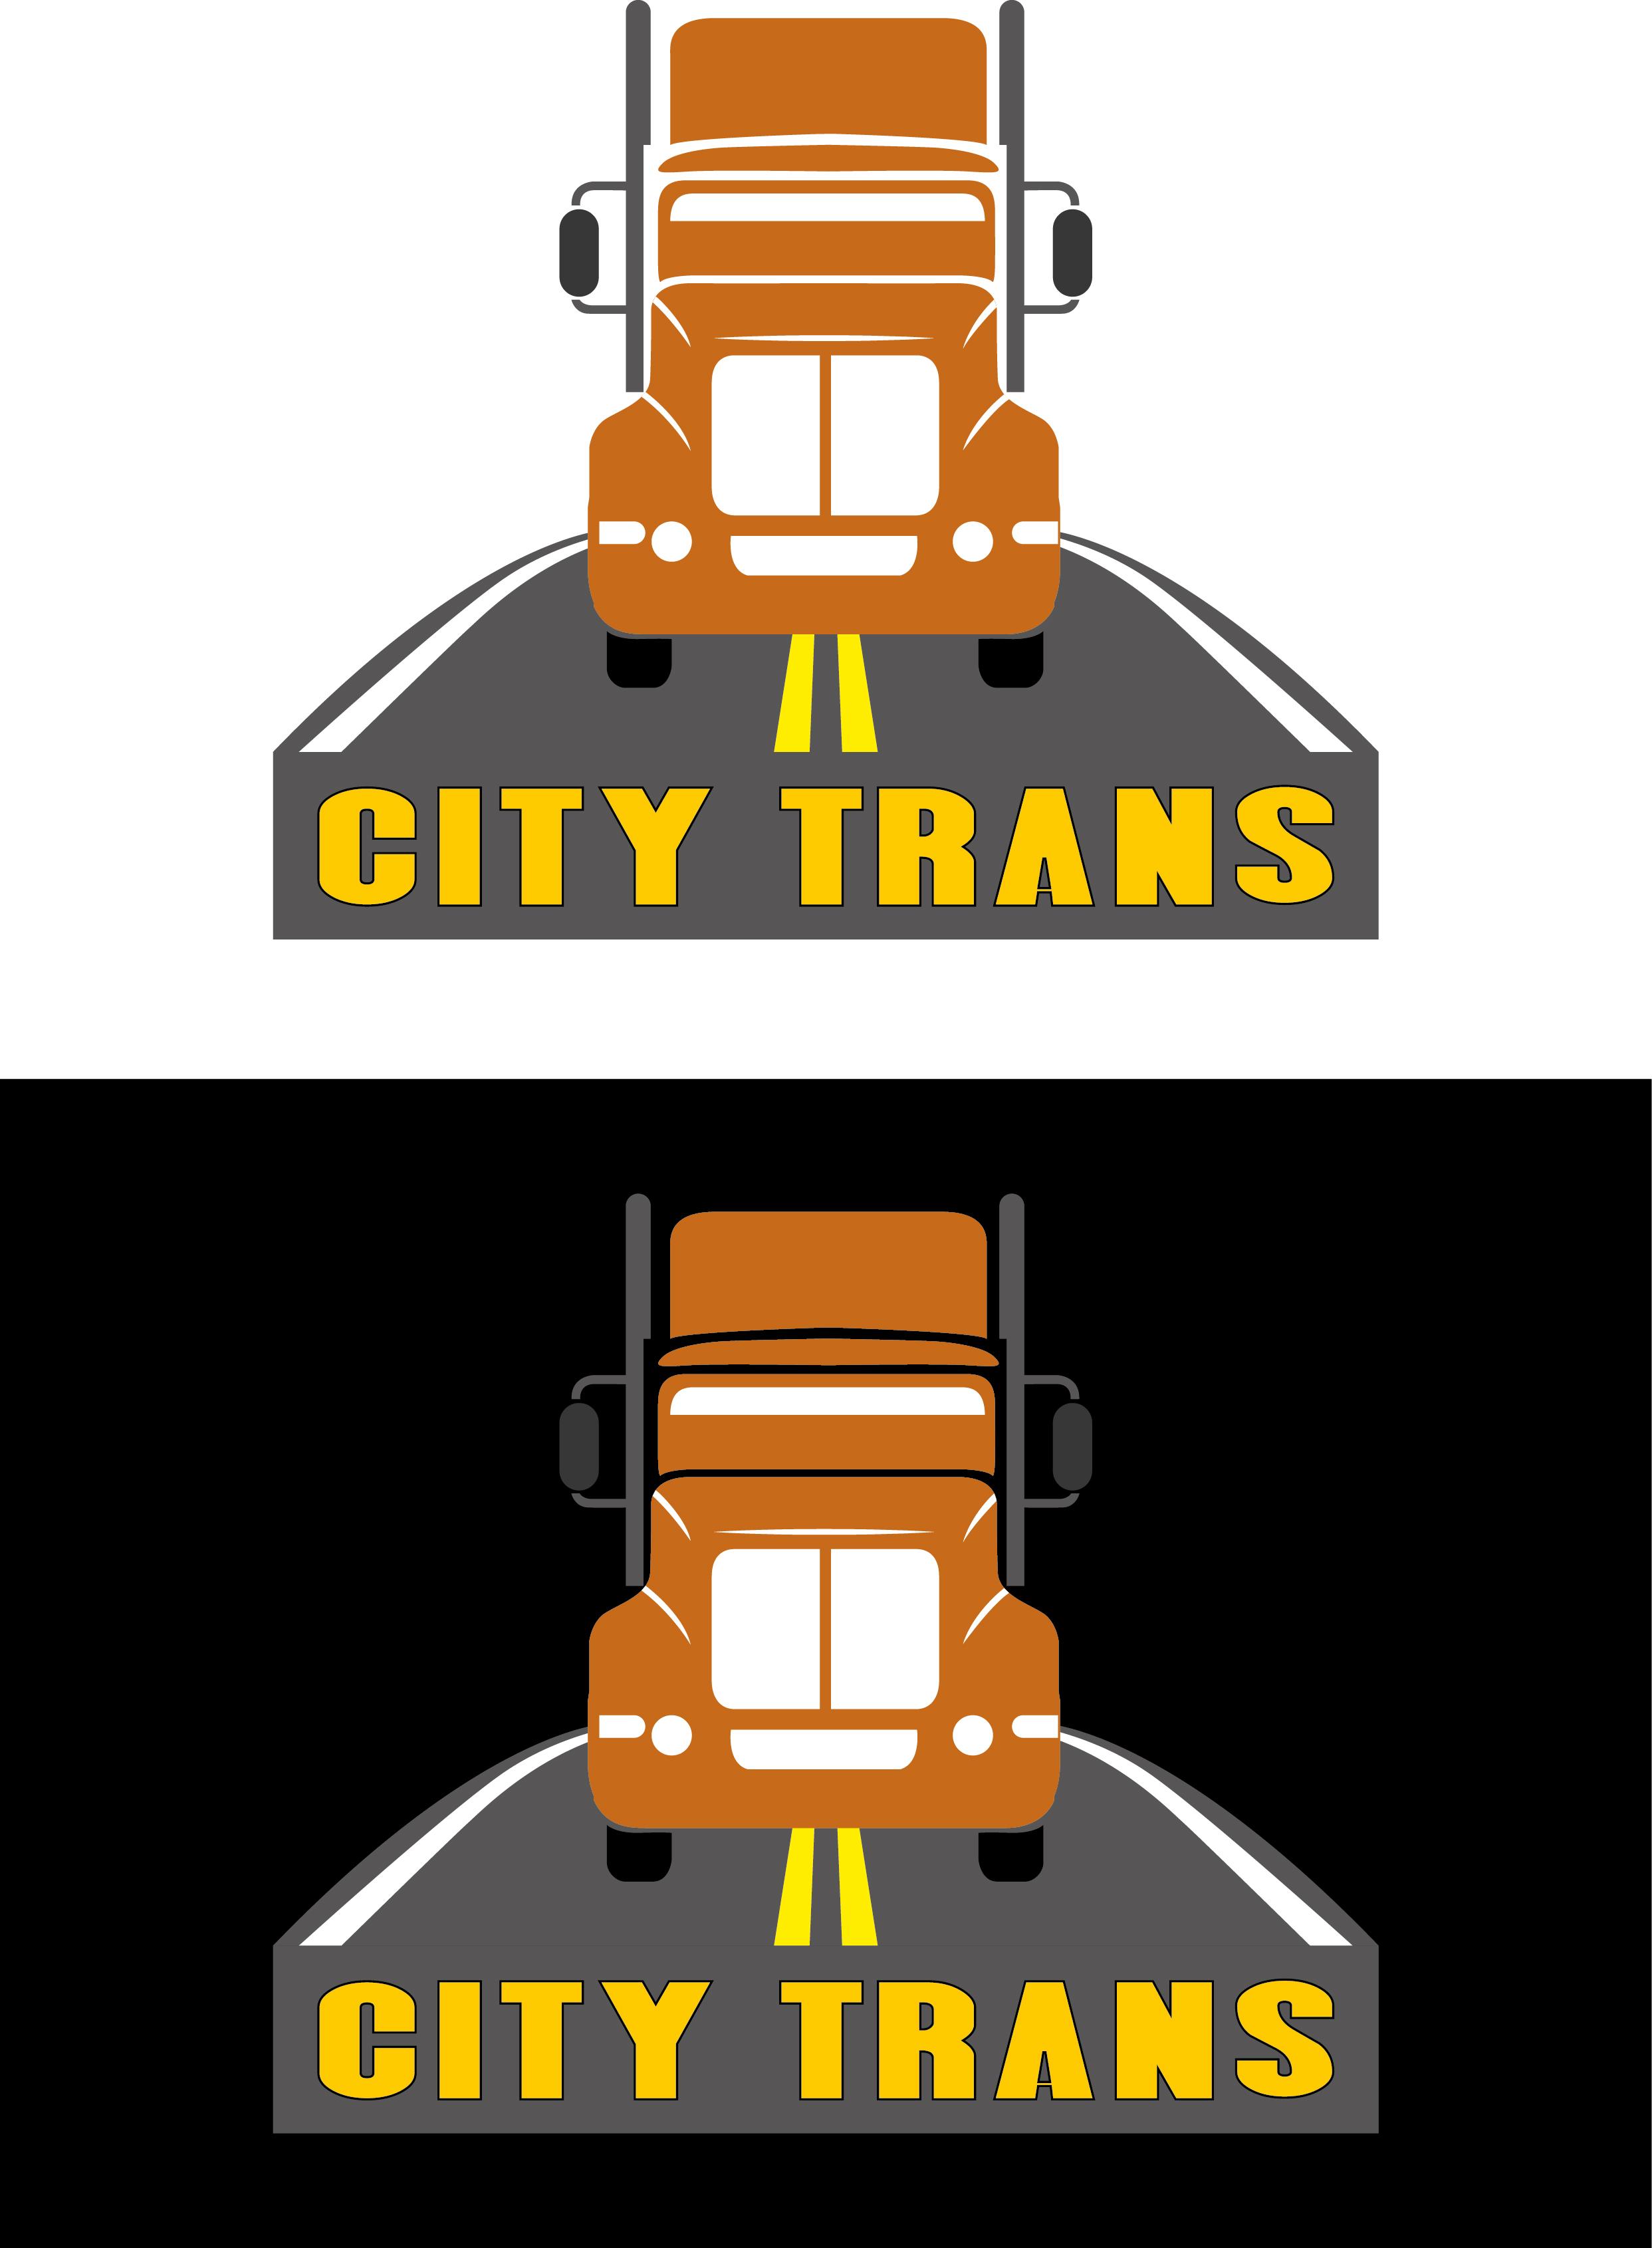 Разработка Логотипа транспортной компании фото f_8245e6dfcd40dac5.jpg